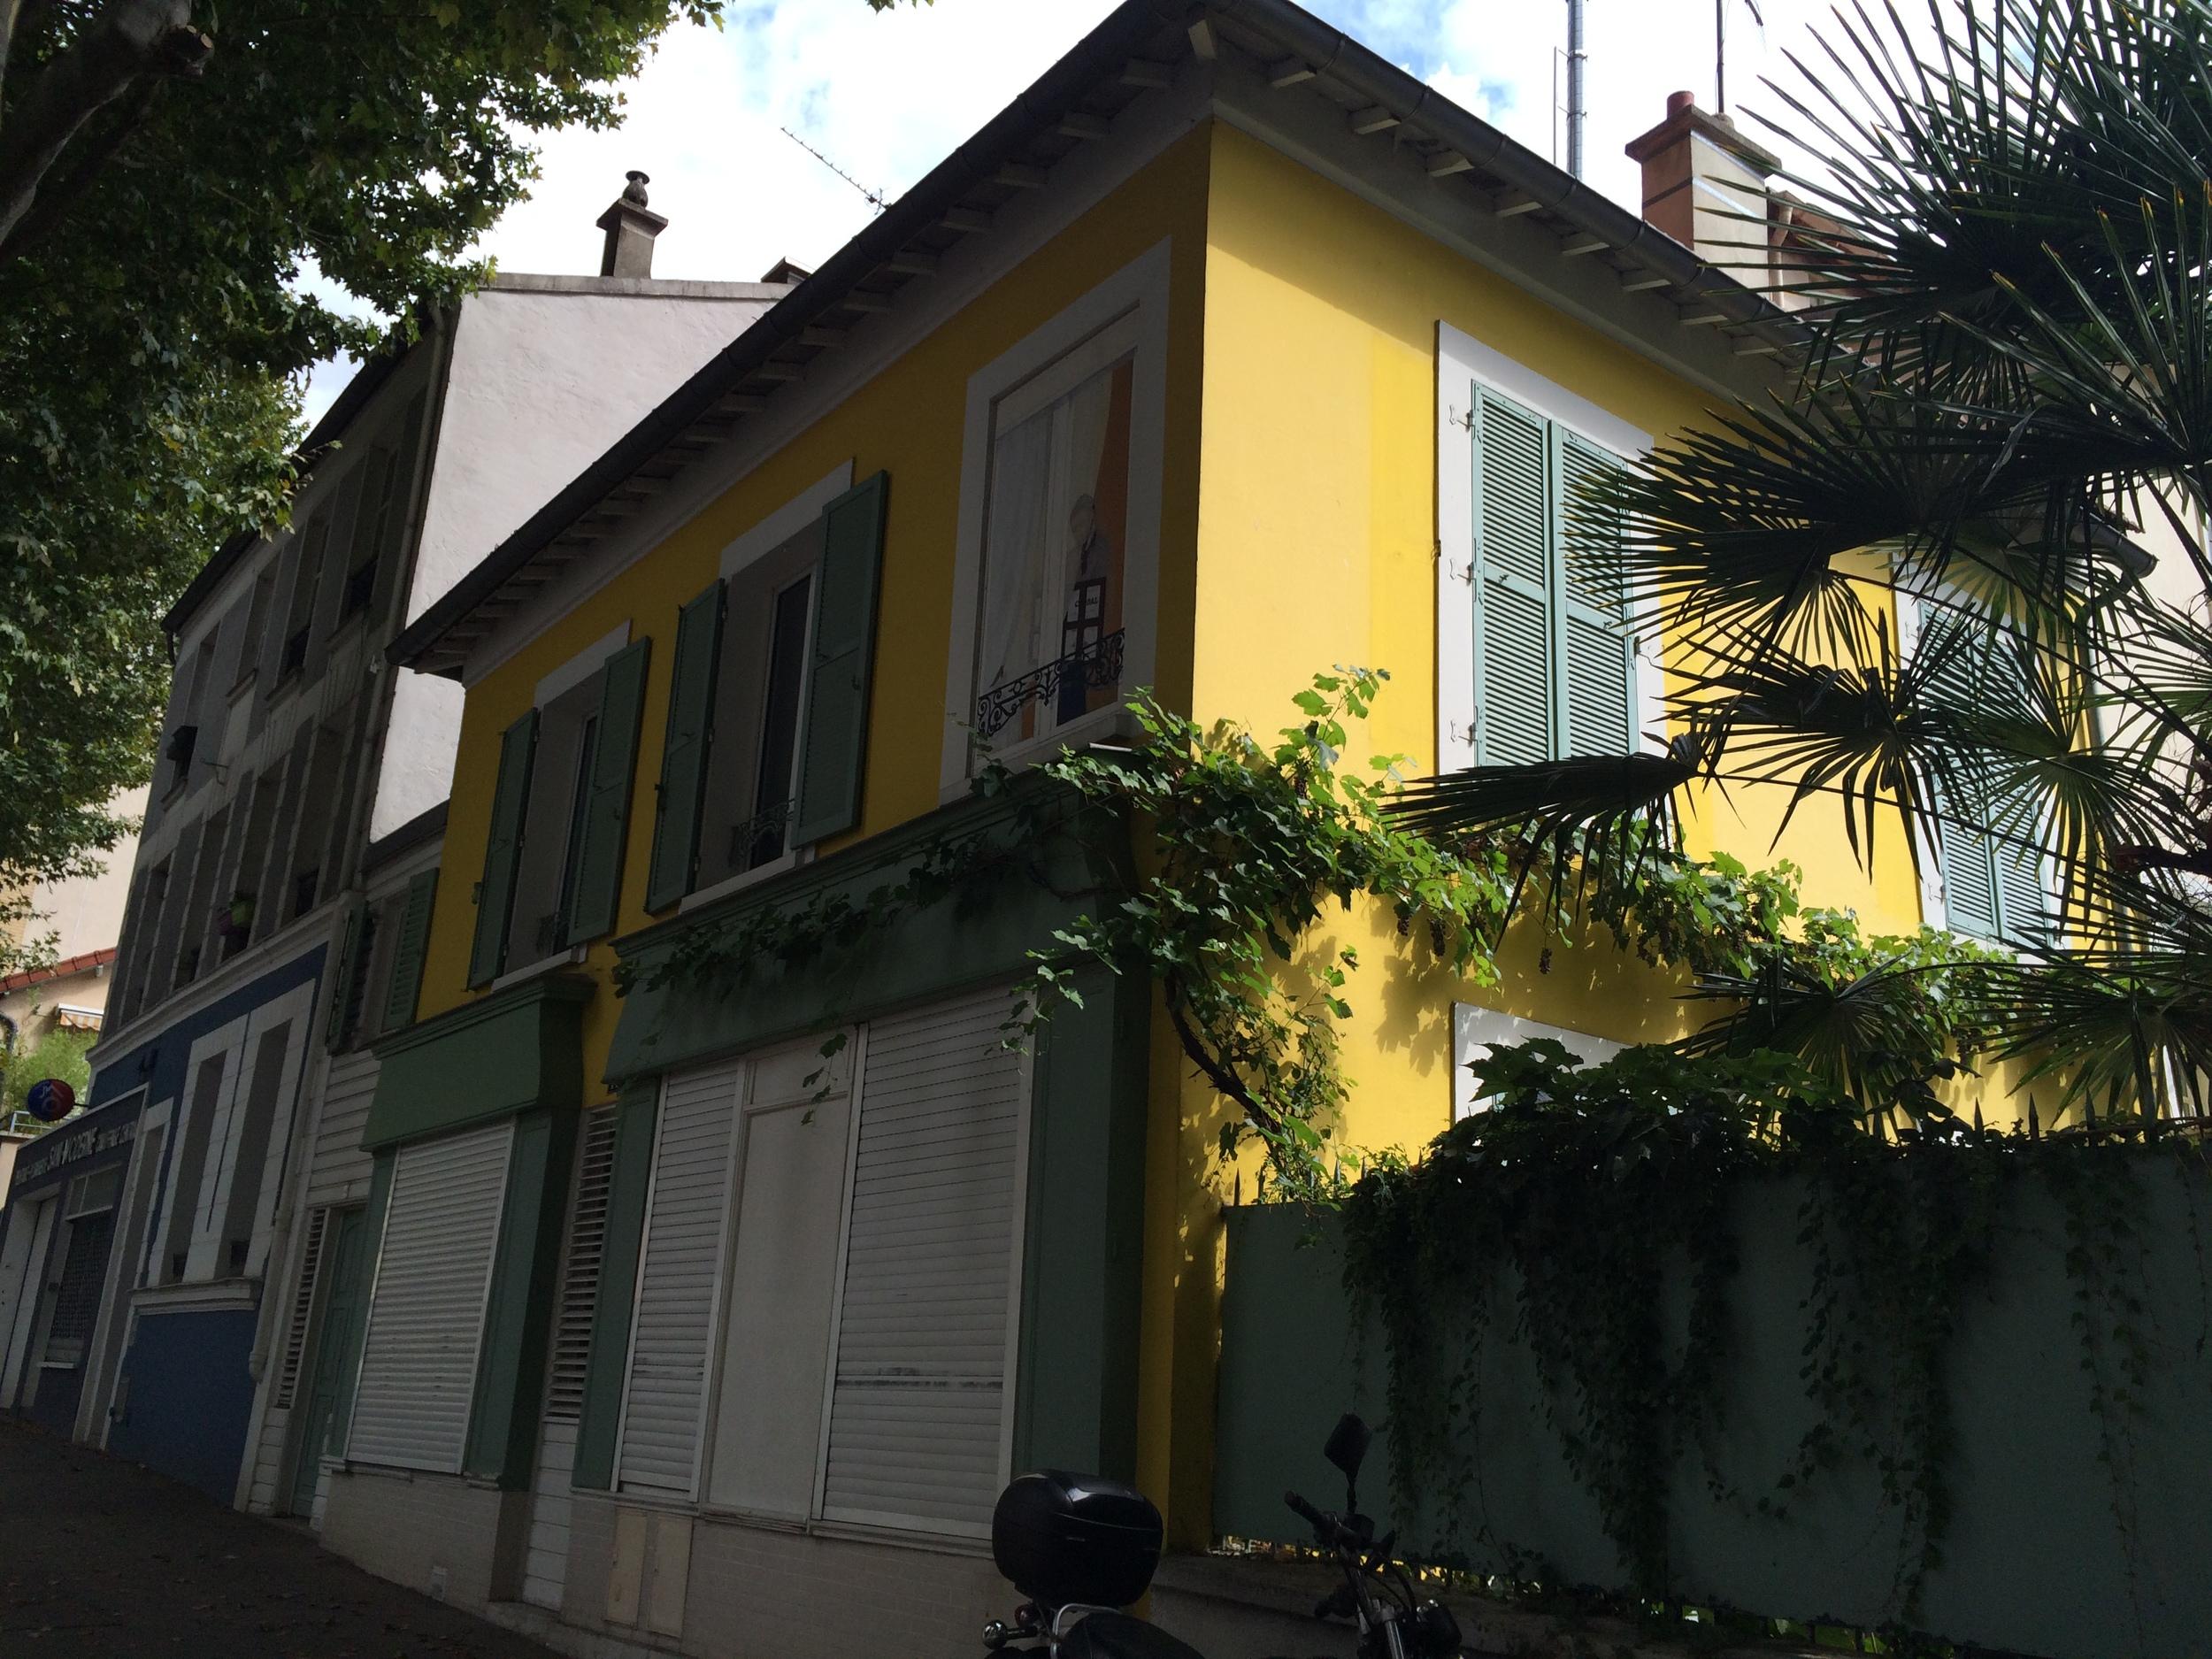 On Rue Mouzaïa. Reminds me of Key West.